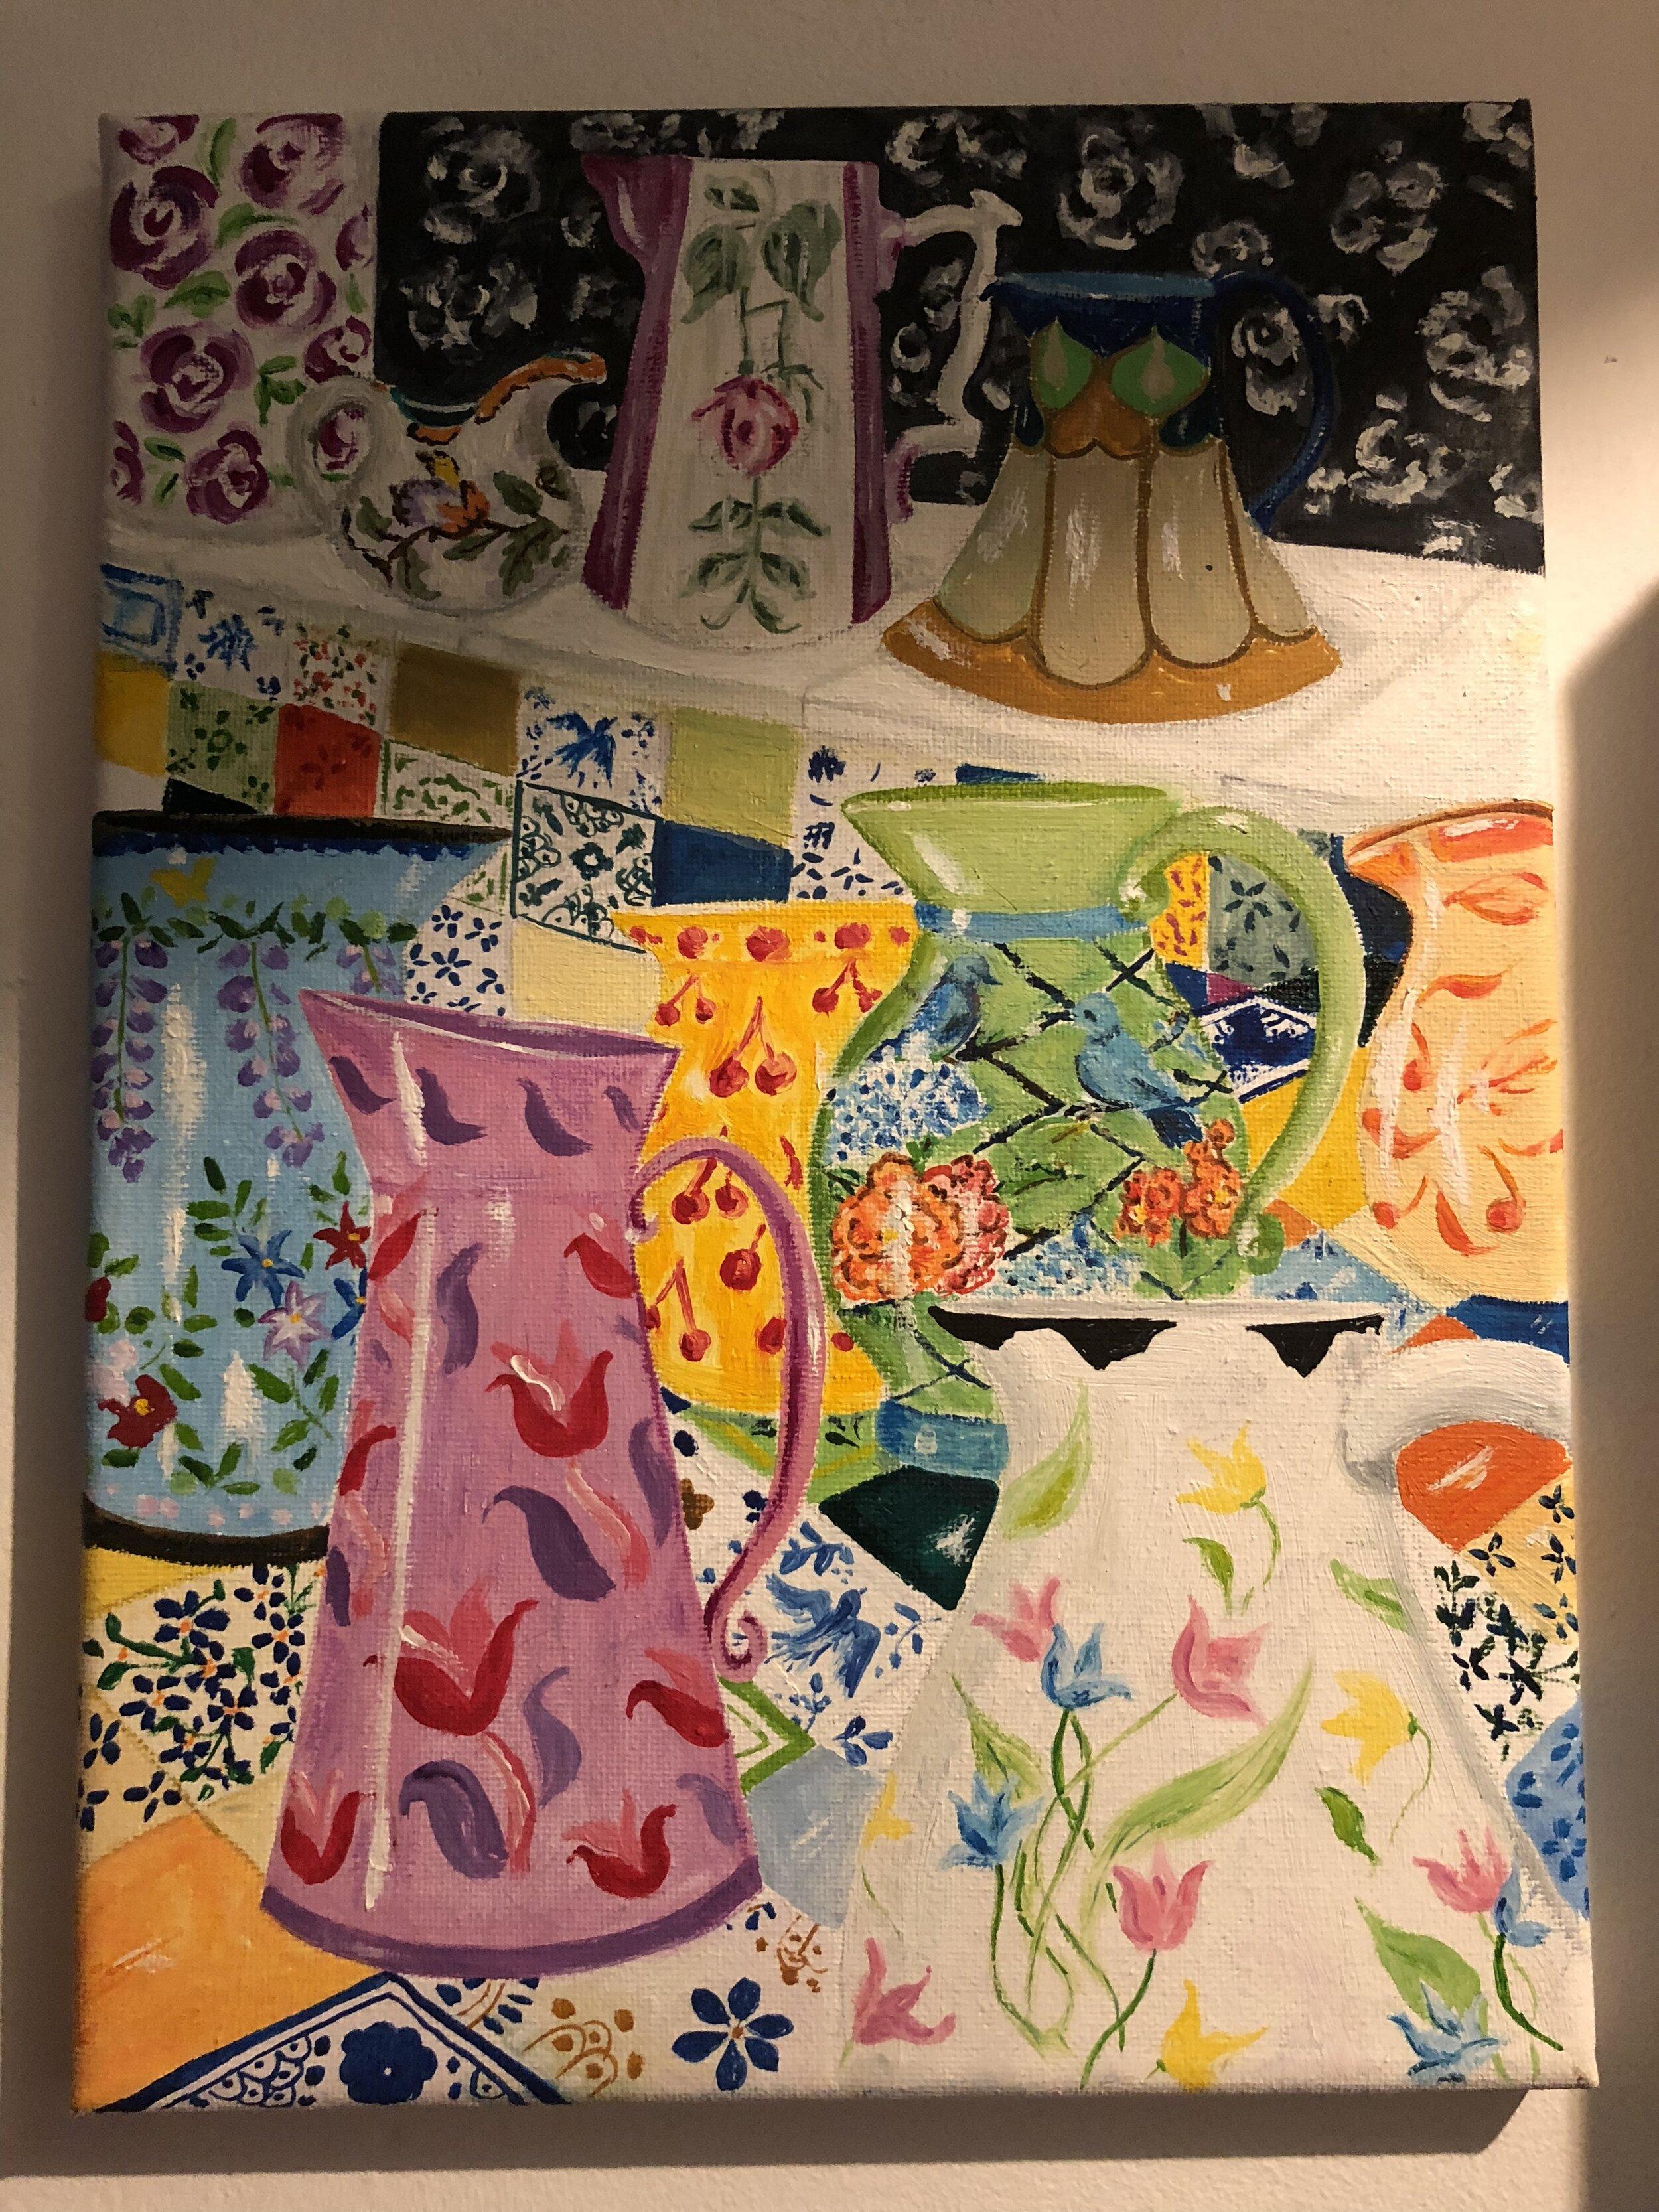 Floral Jugs